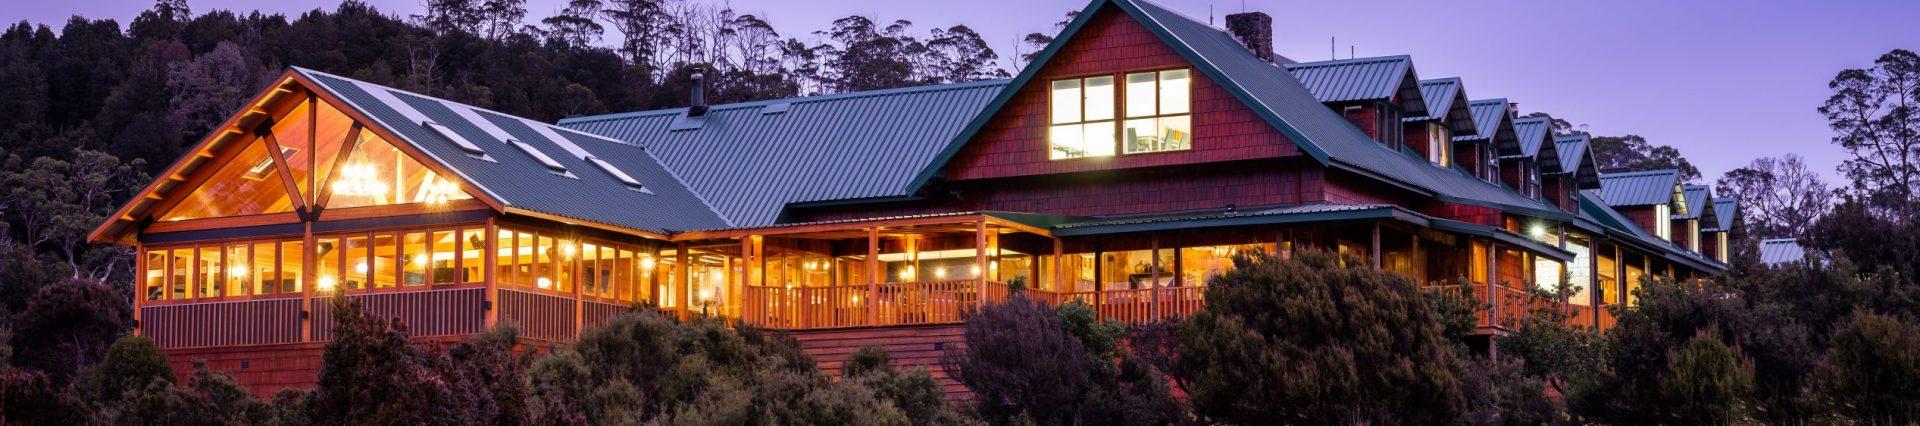 Cradle Mountain Lodge - 3